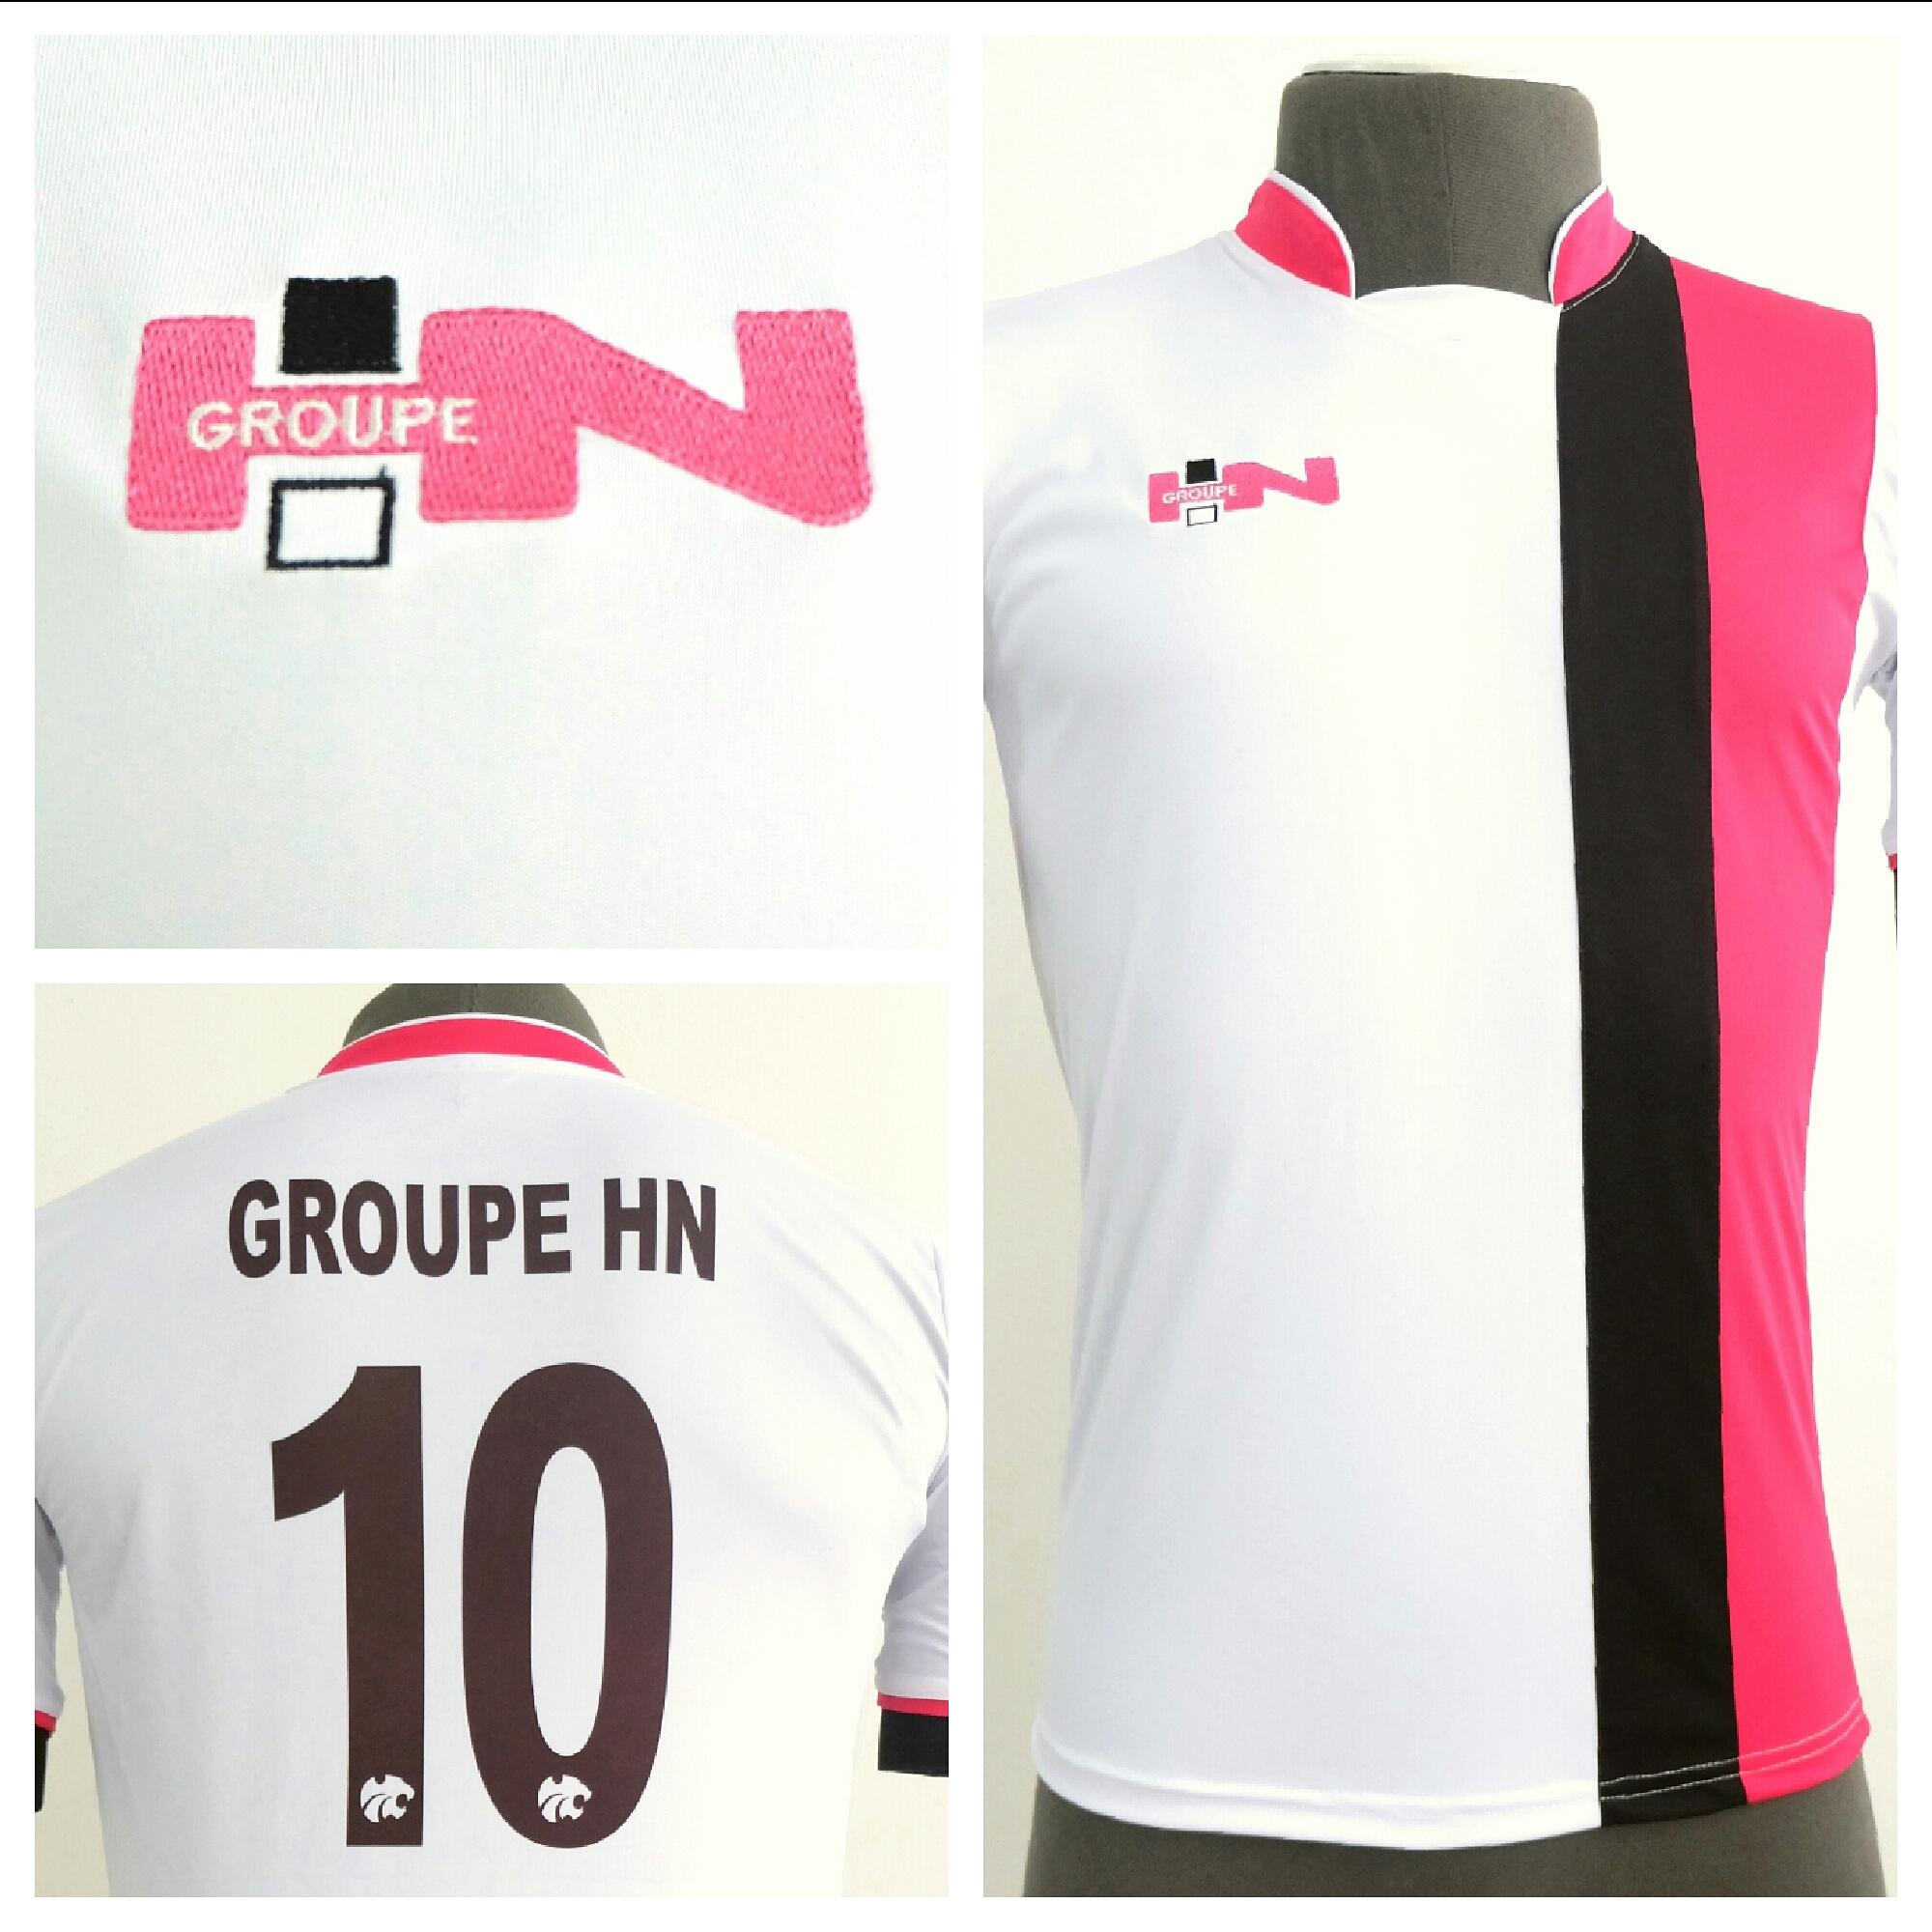 Creer un maillot de foot personnalis pour votre club - Cadre maillot de foot ...